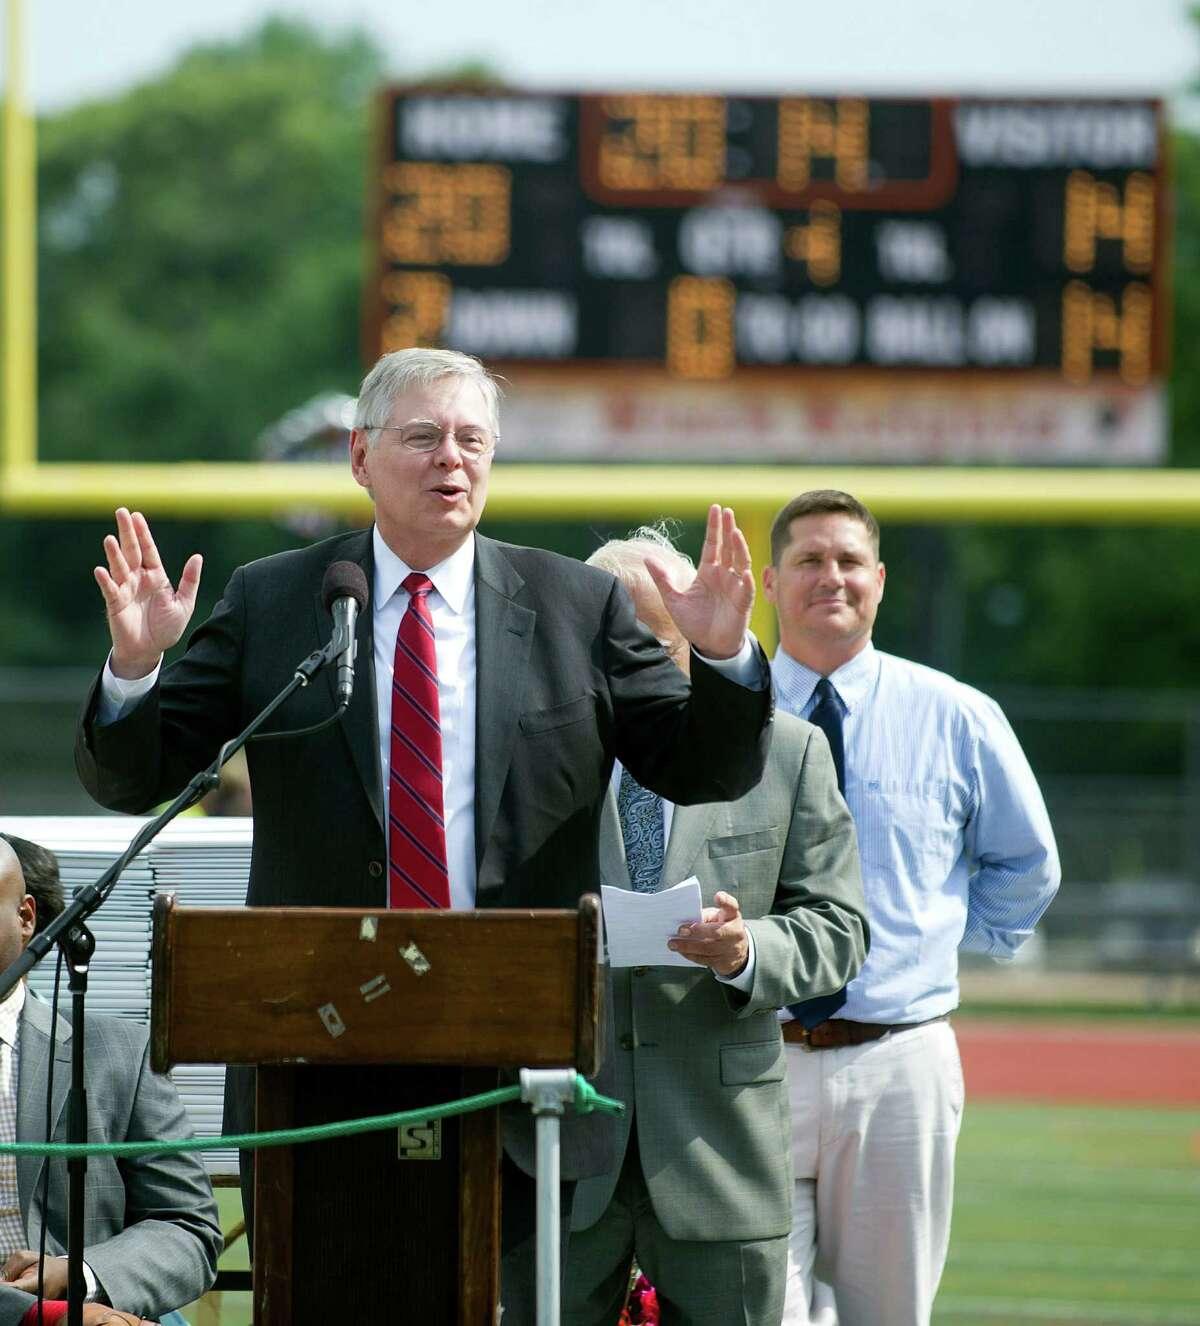 Stamford Mayor David Martin speaks during the Stamford High School commencement ceremony on Thursday, June 19, 2014.